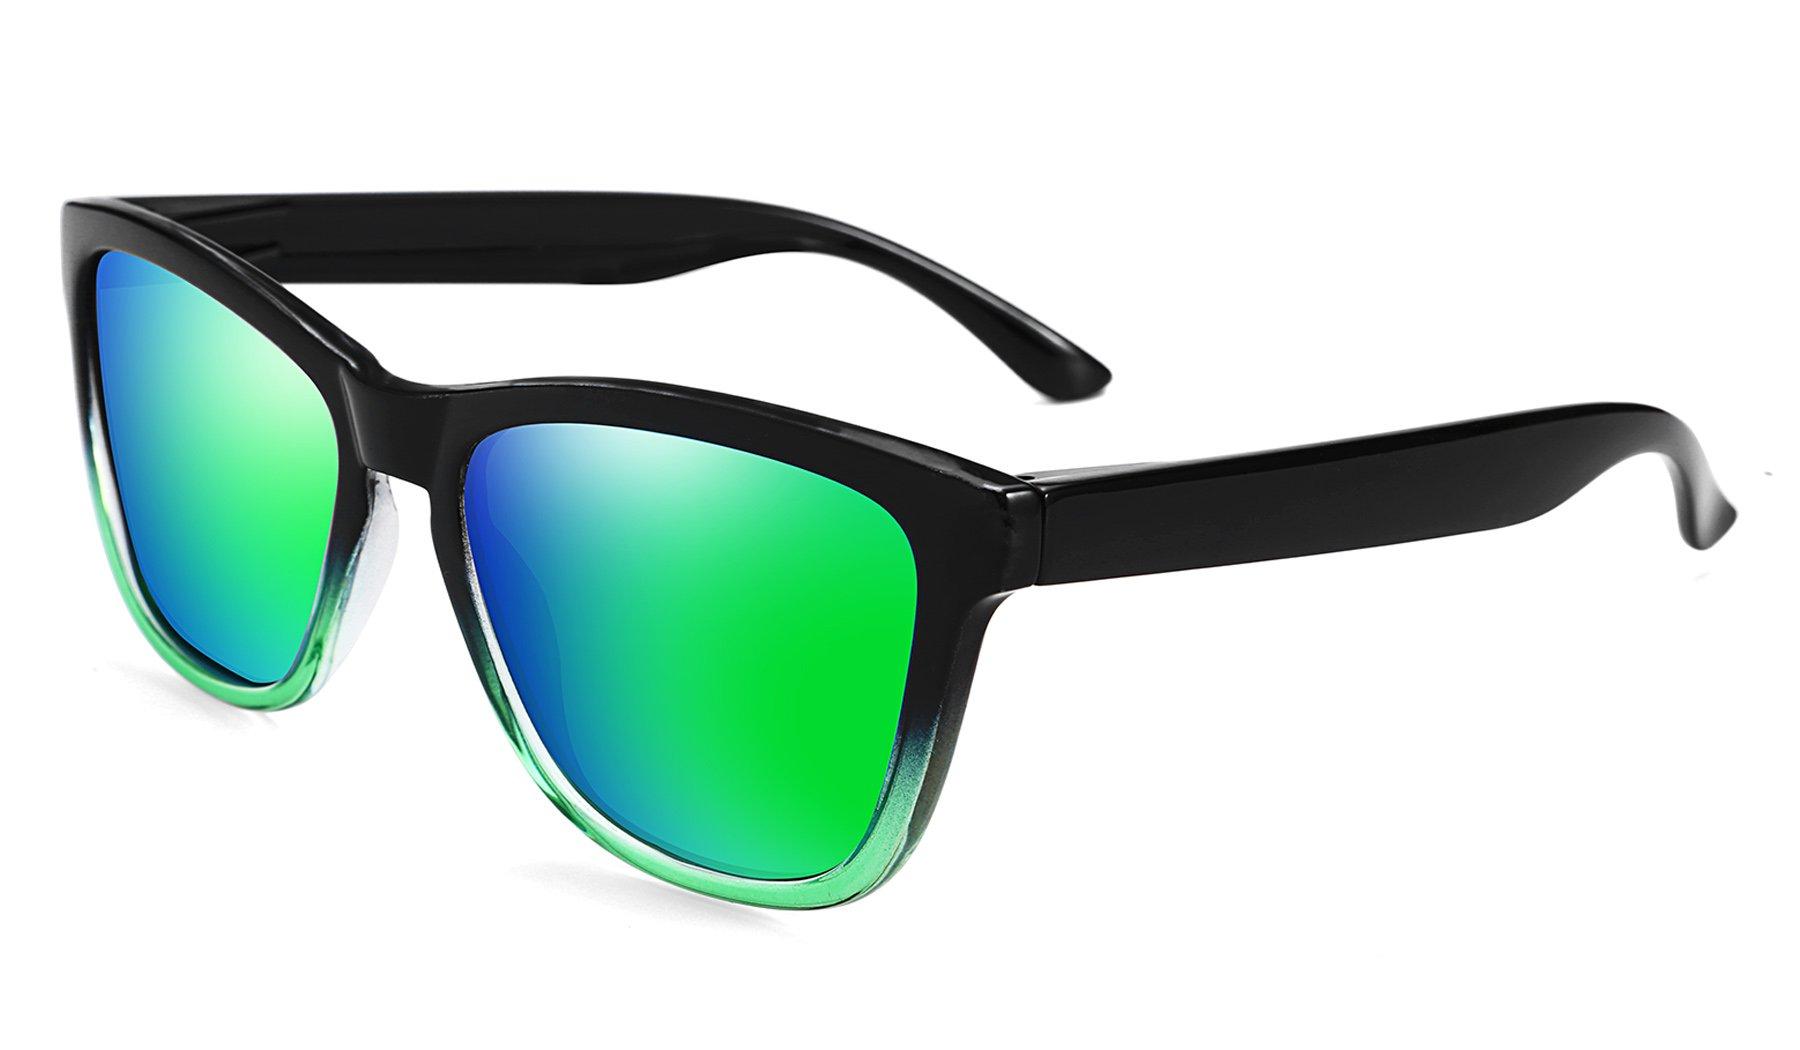 FEISEDY Great Classic Polarized Sunglasses Men Women Mirrored HD Lens B1858 (Gradient Frame Blue Mirrored Lens, 54)